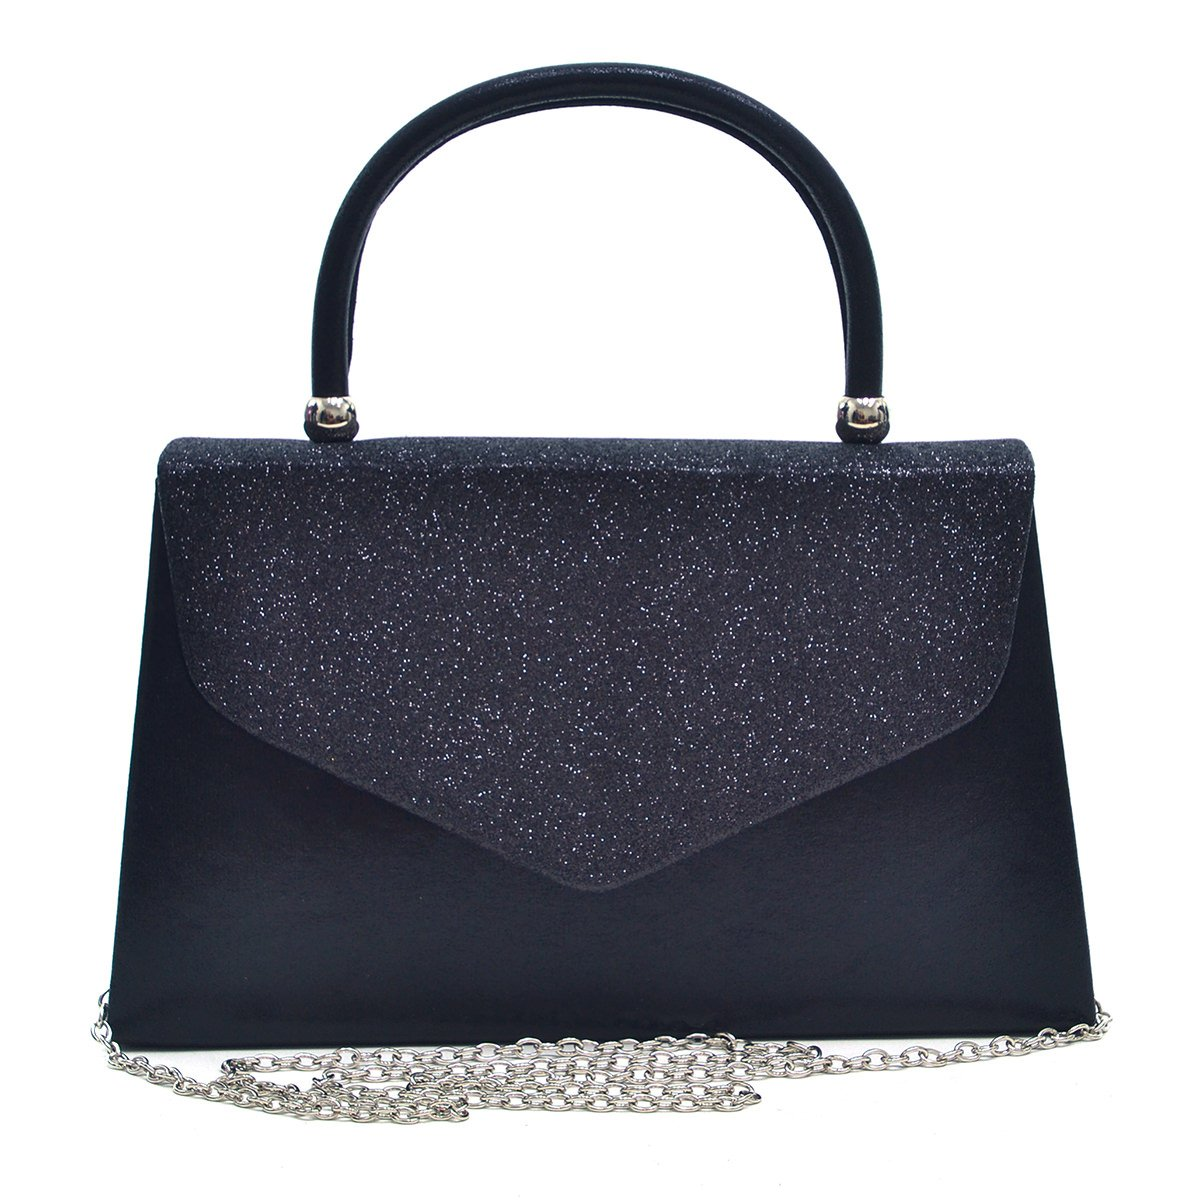 Envelope Clutch Handbag Evening Bag Top Handle Purse Glitter Sequin Prom Black